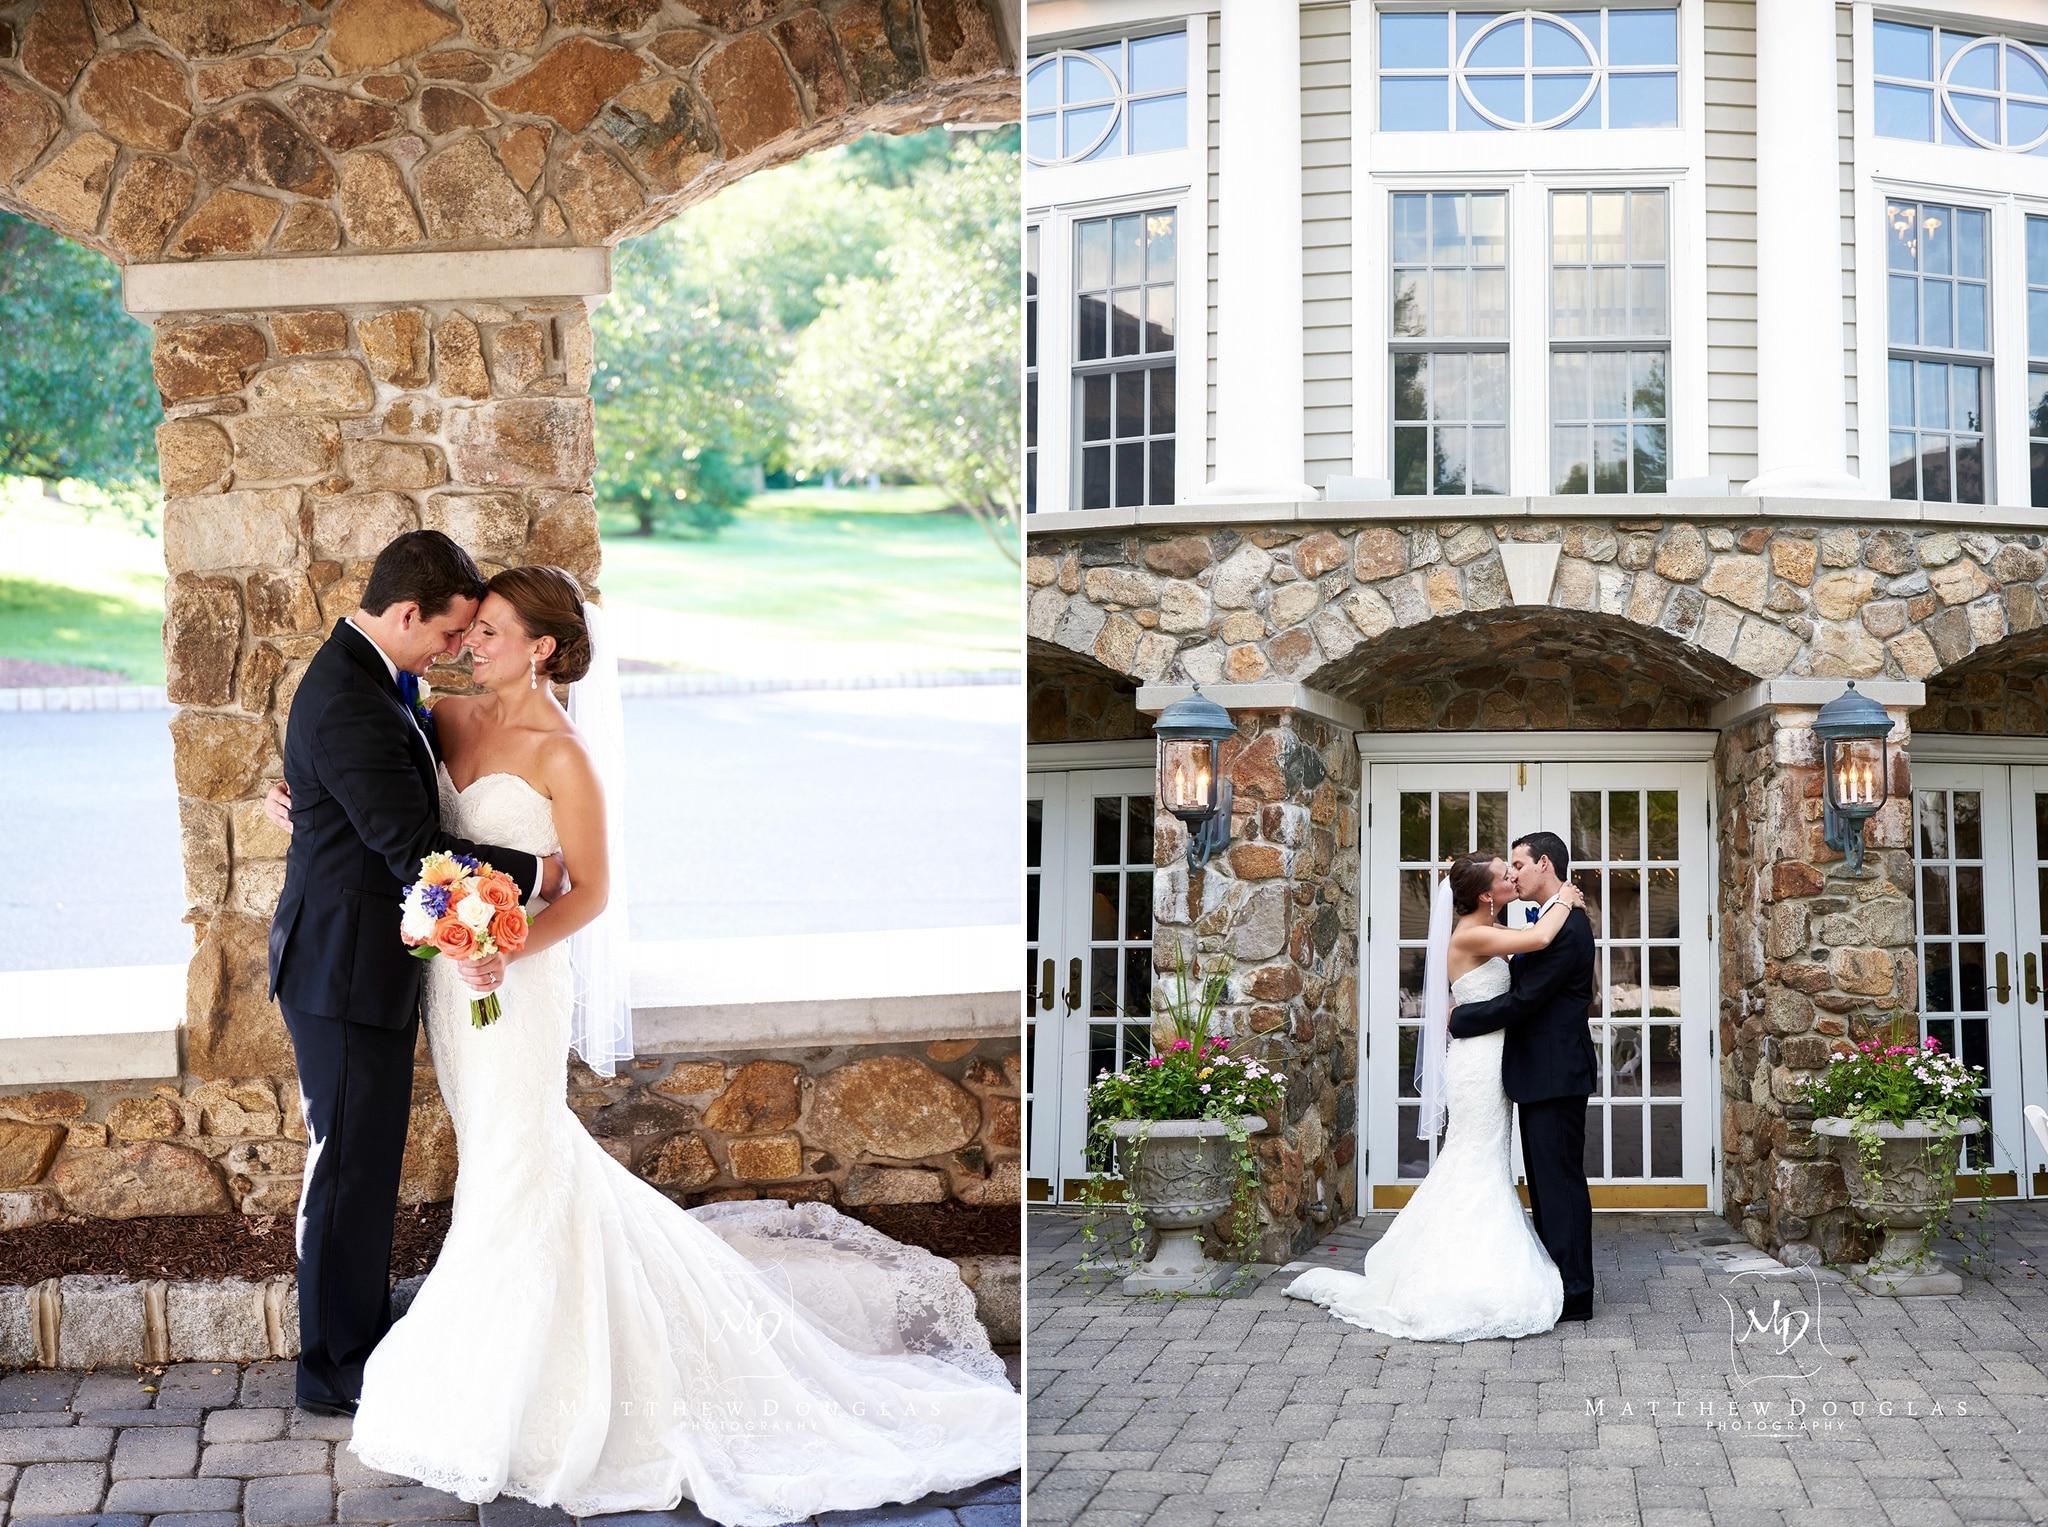 Wedding at The Olde Mill Inn Basking Ridge NJ